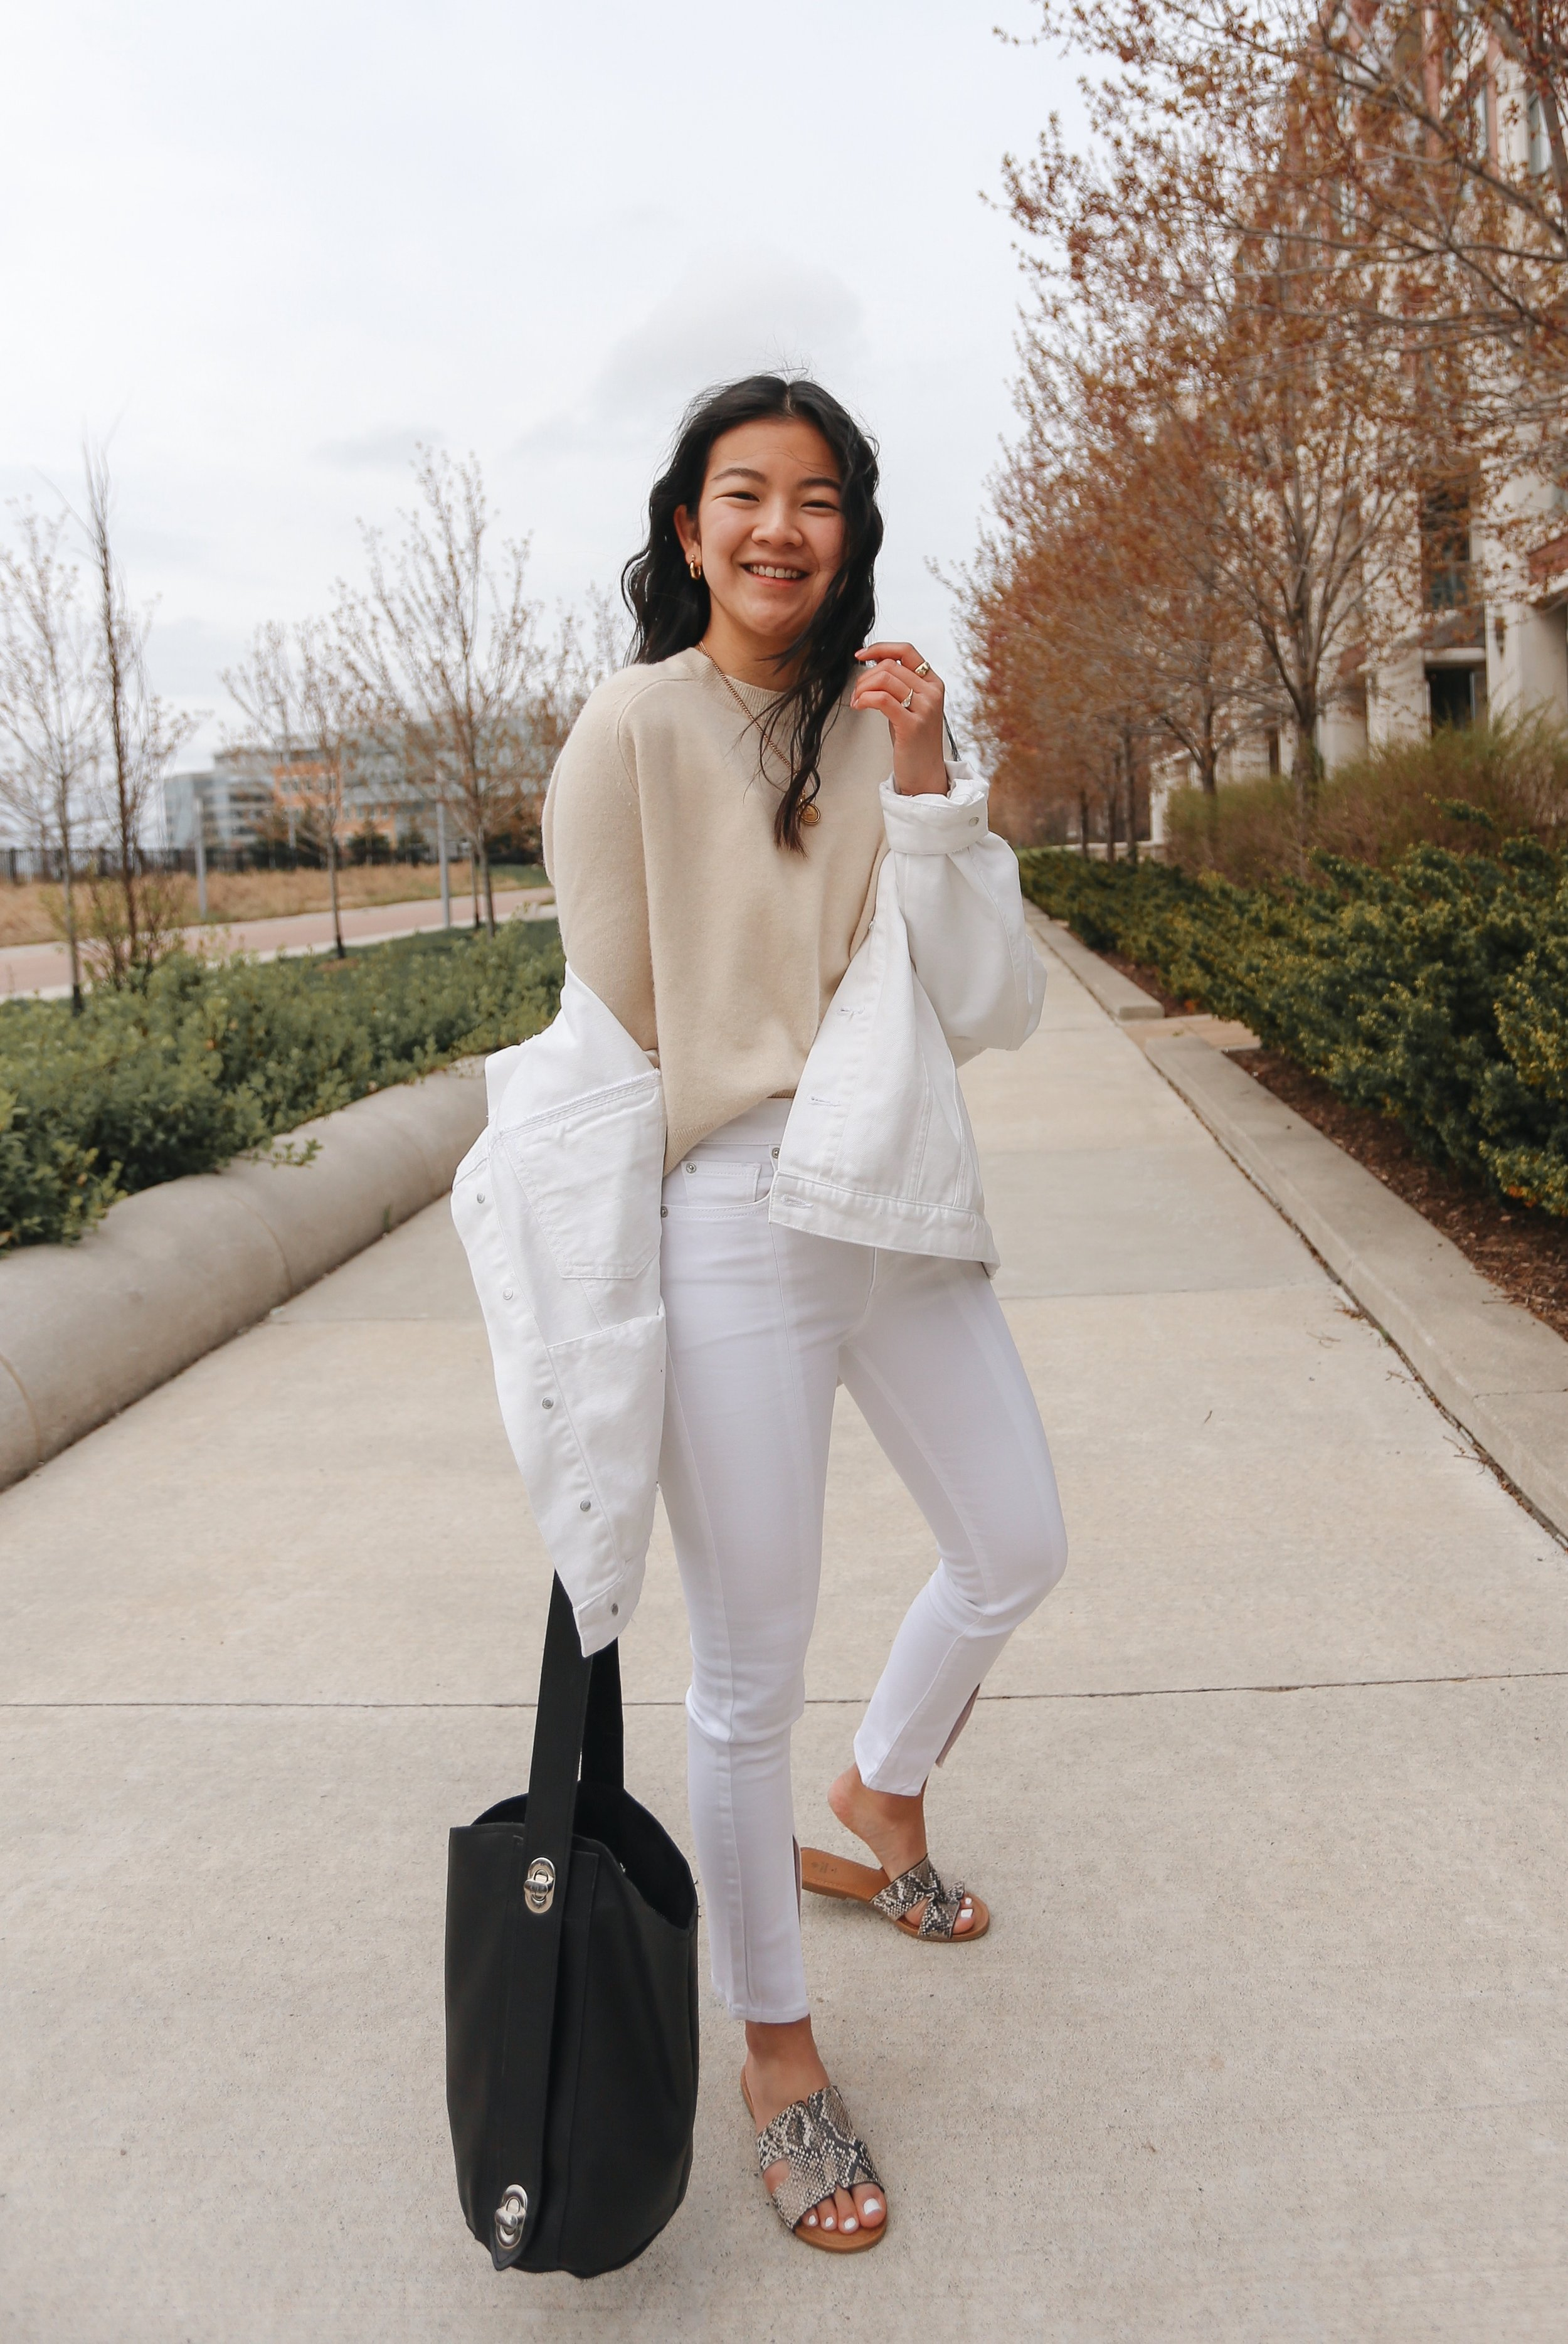 sonya lee bag - the hold everything bag